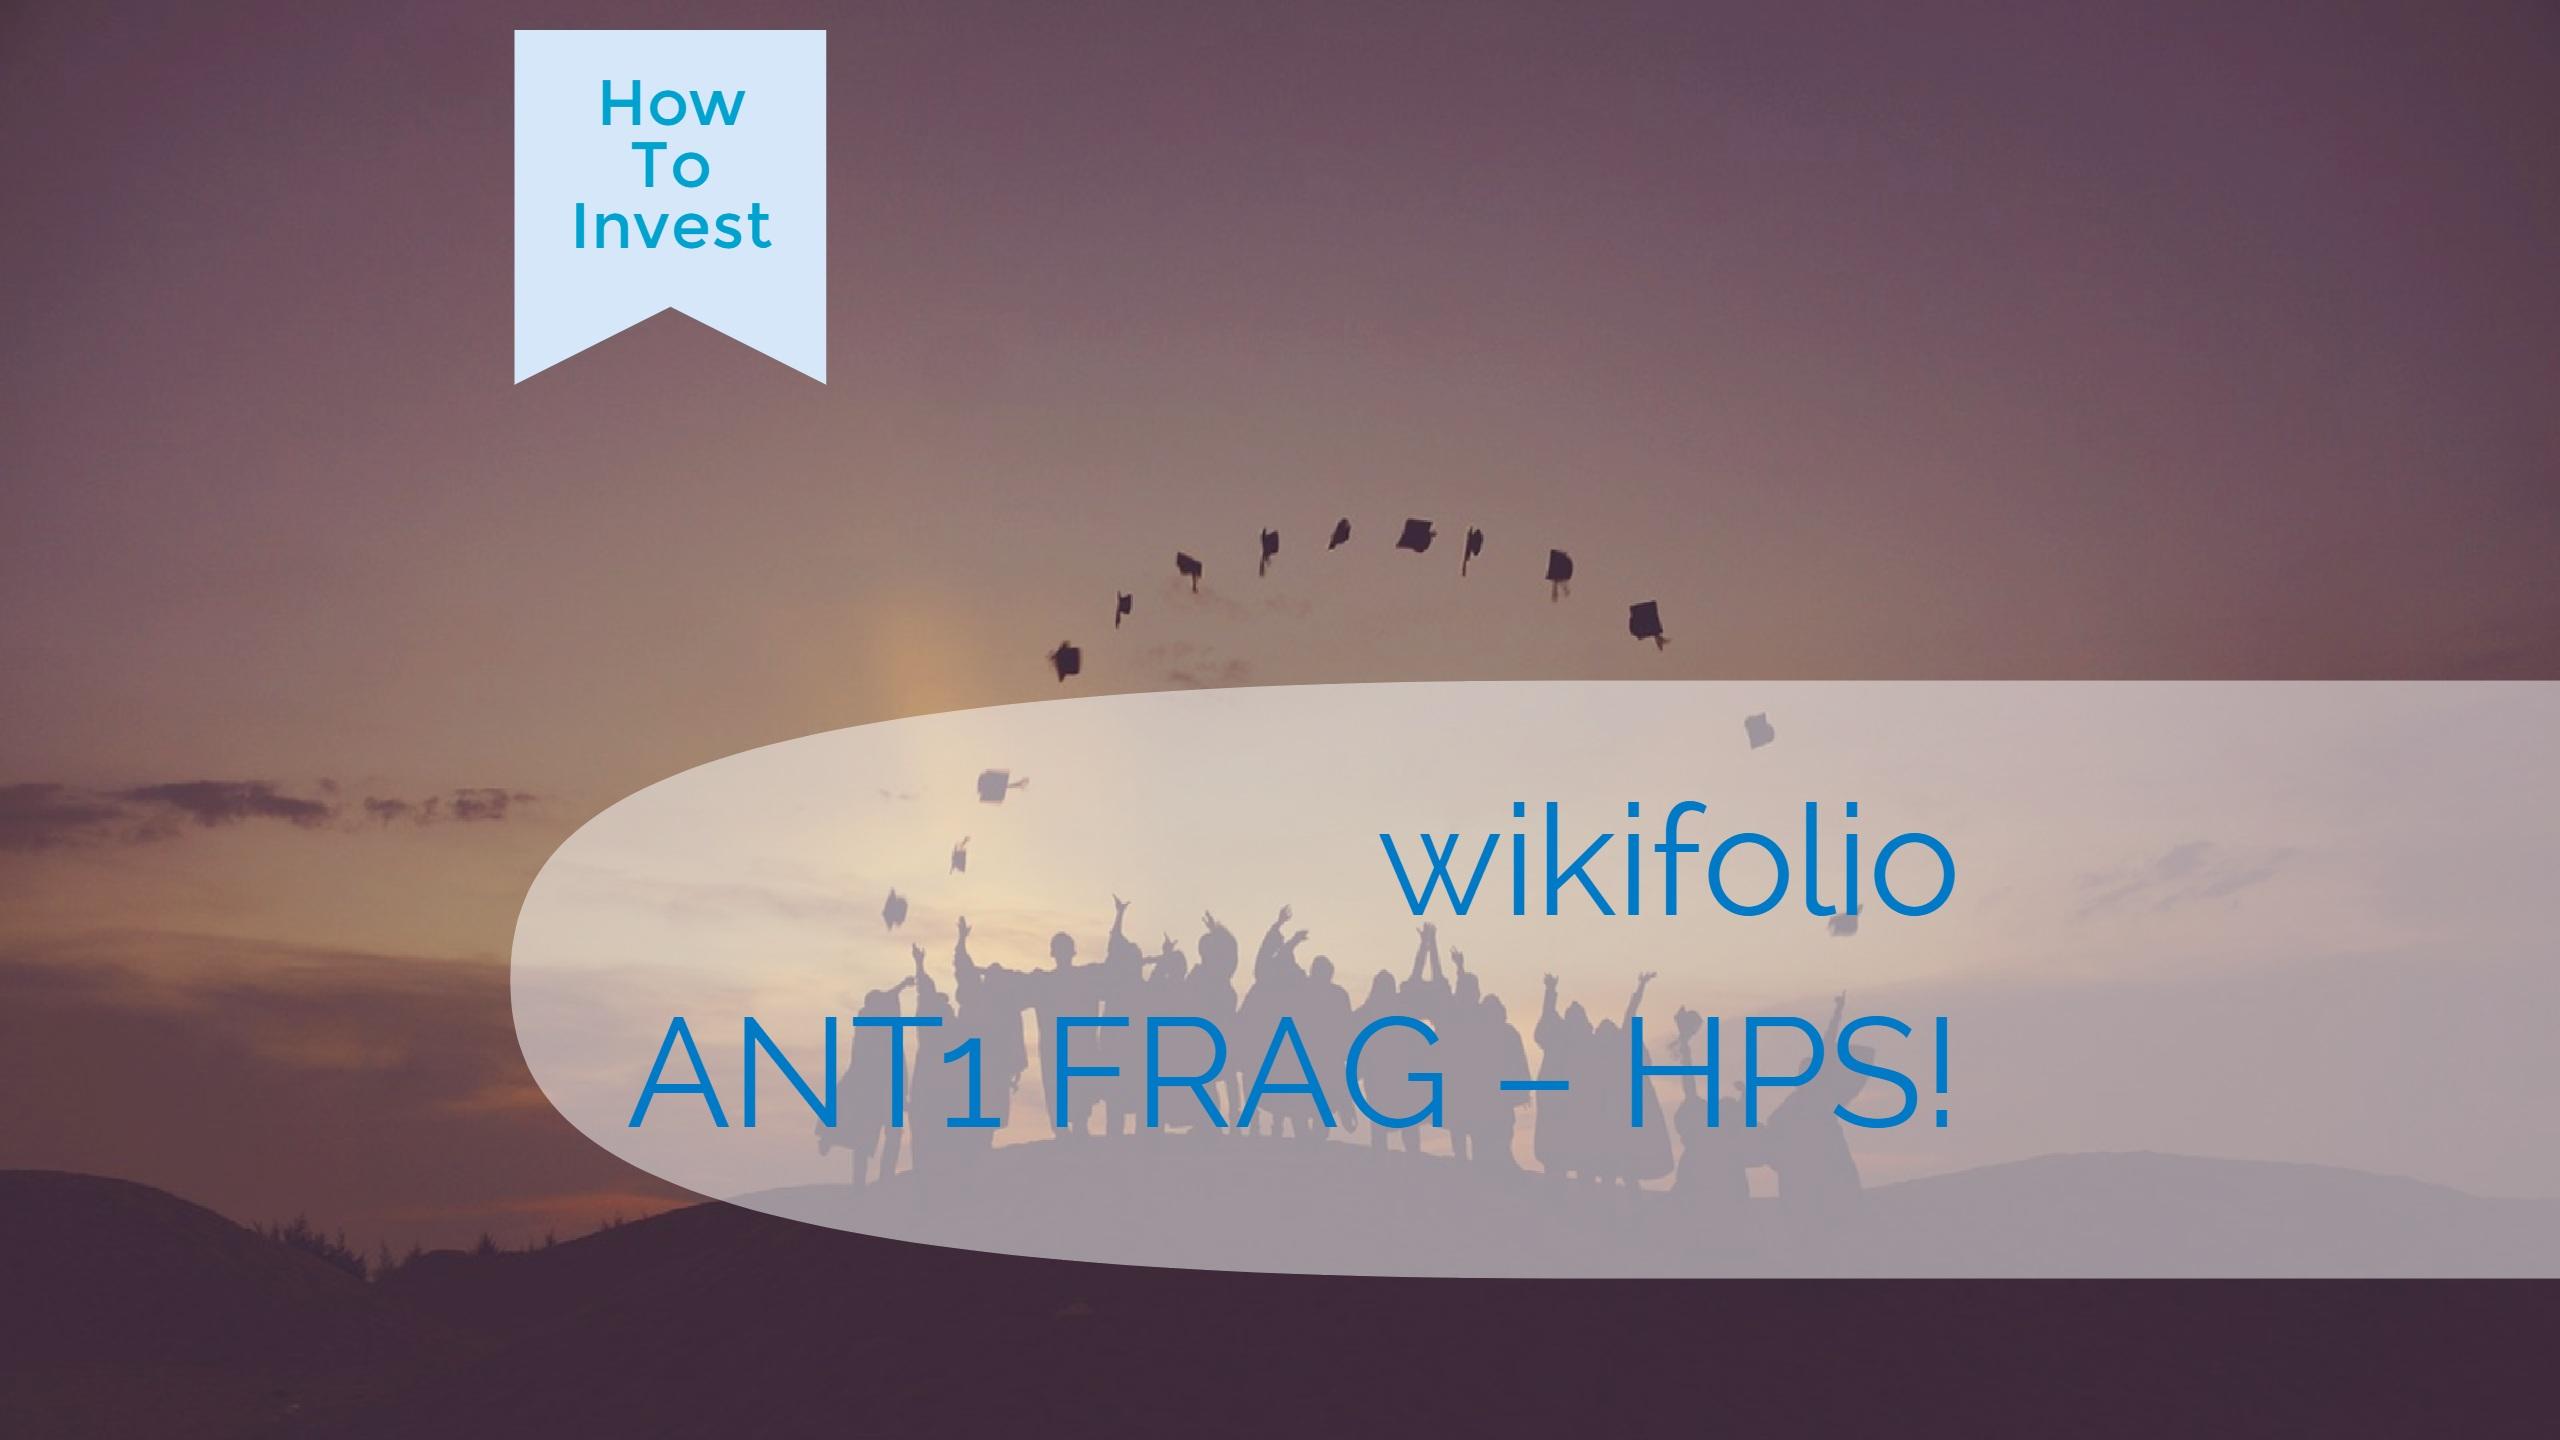 wikifolio ANT1 FRAG - HPS worldwide